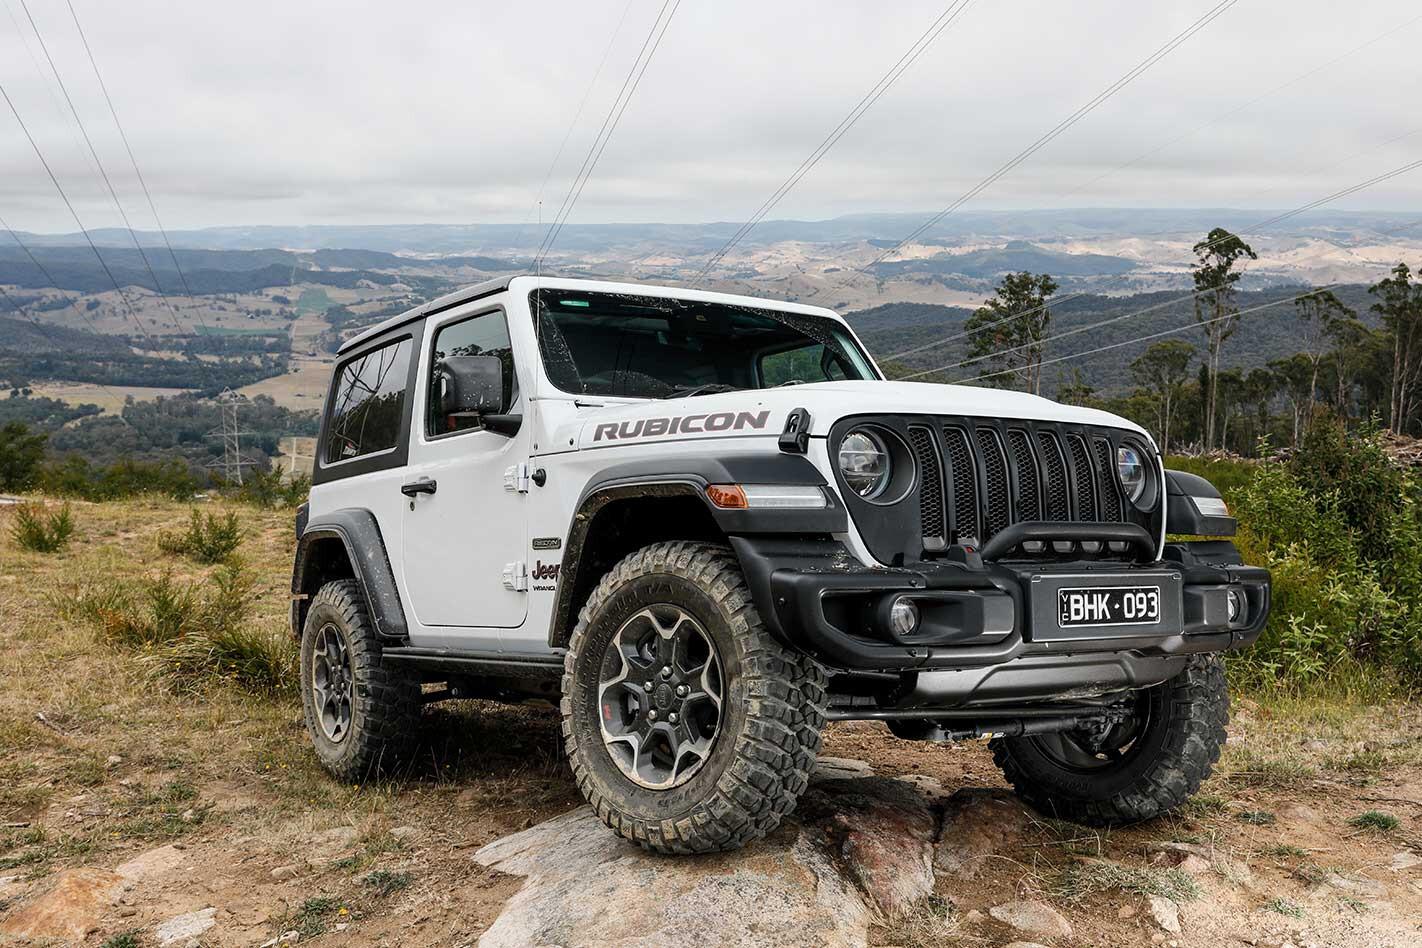 Jeep JL Wrangler Rubicon Recon SWB